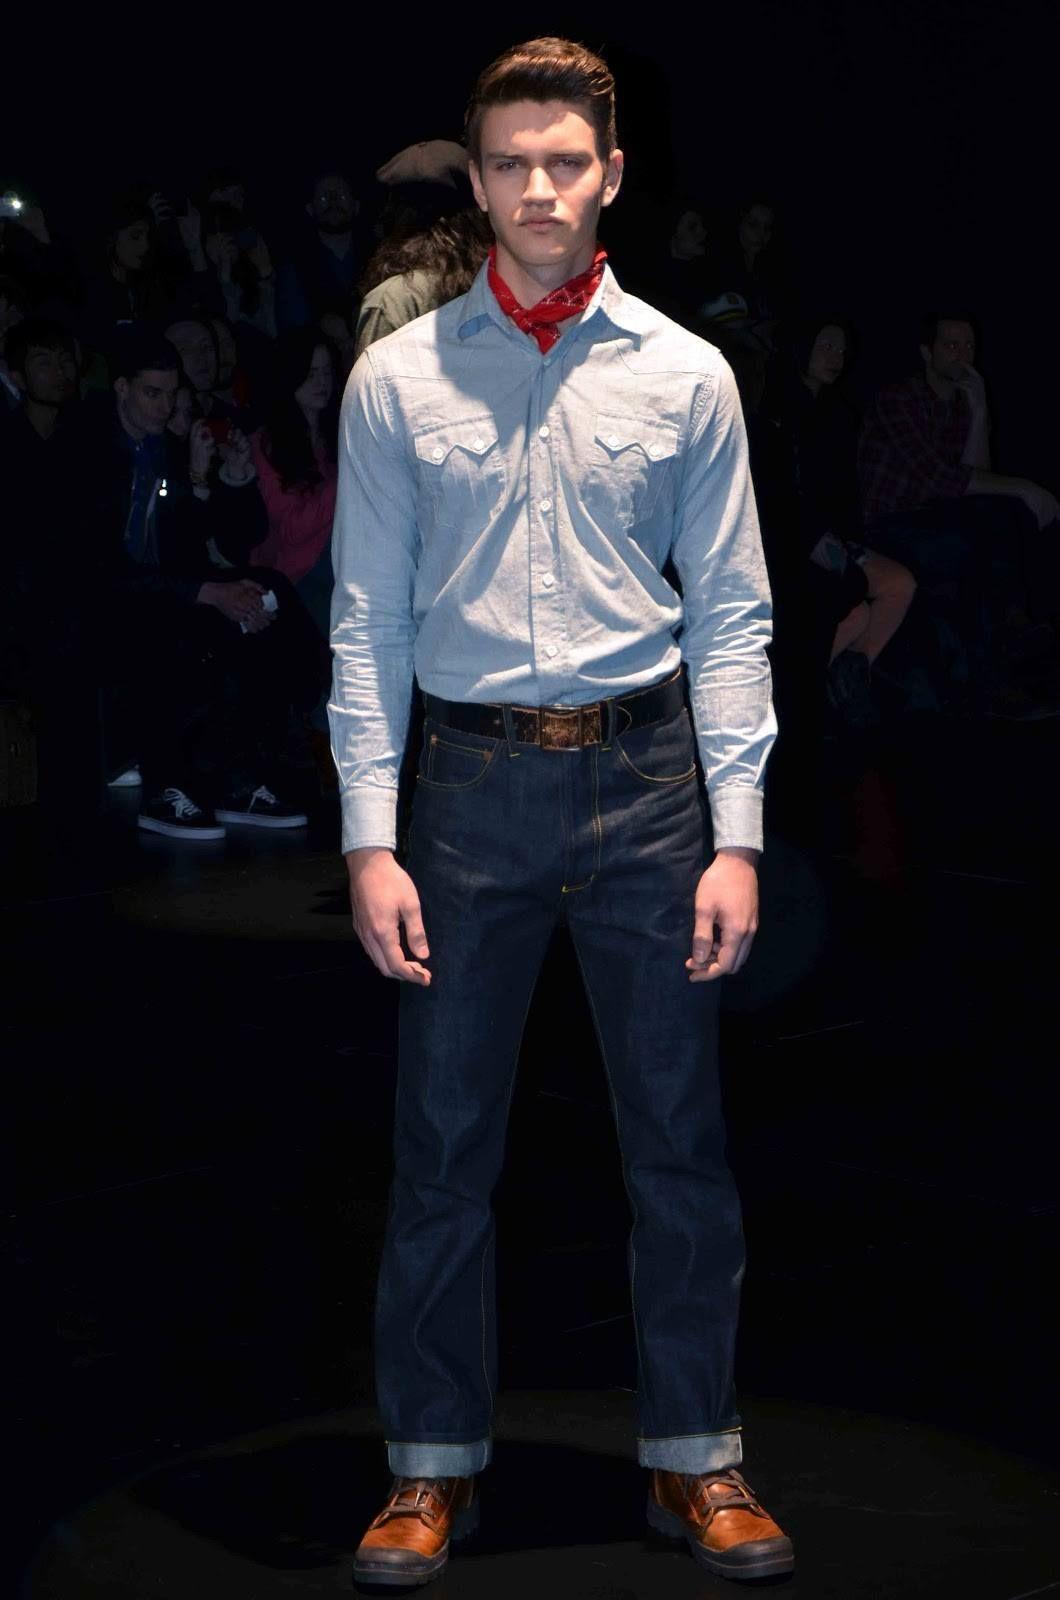 bbefe96a54a Cowboy Outfits-20 Ideas on How to Dress like Cowboy